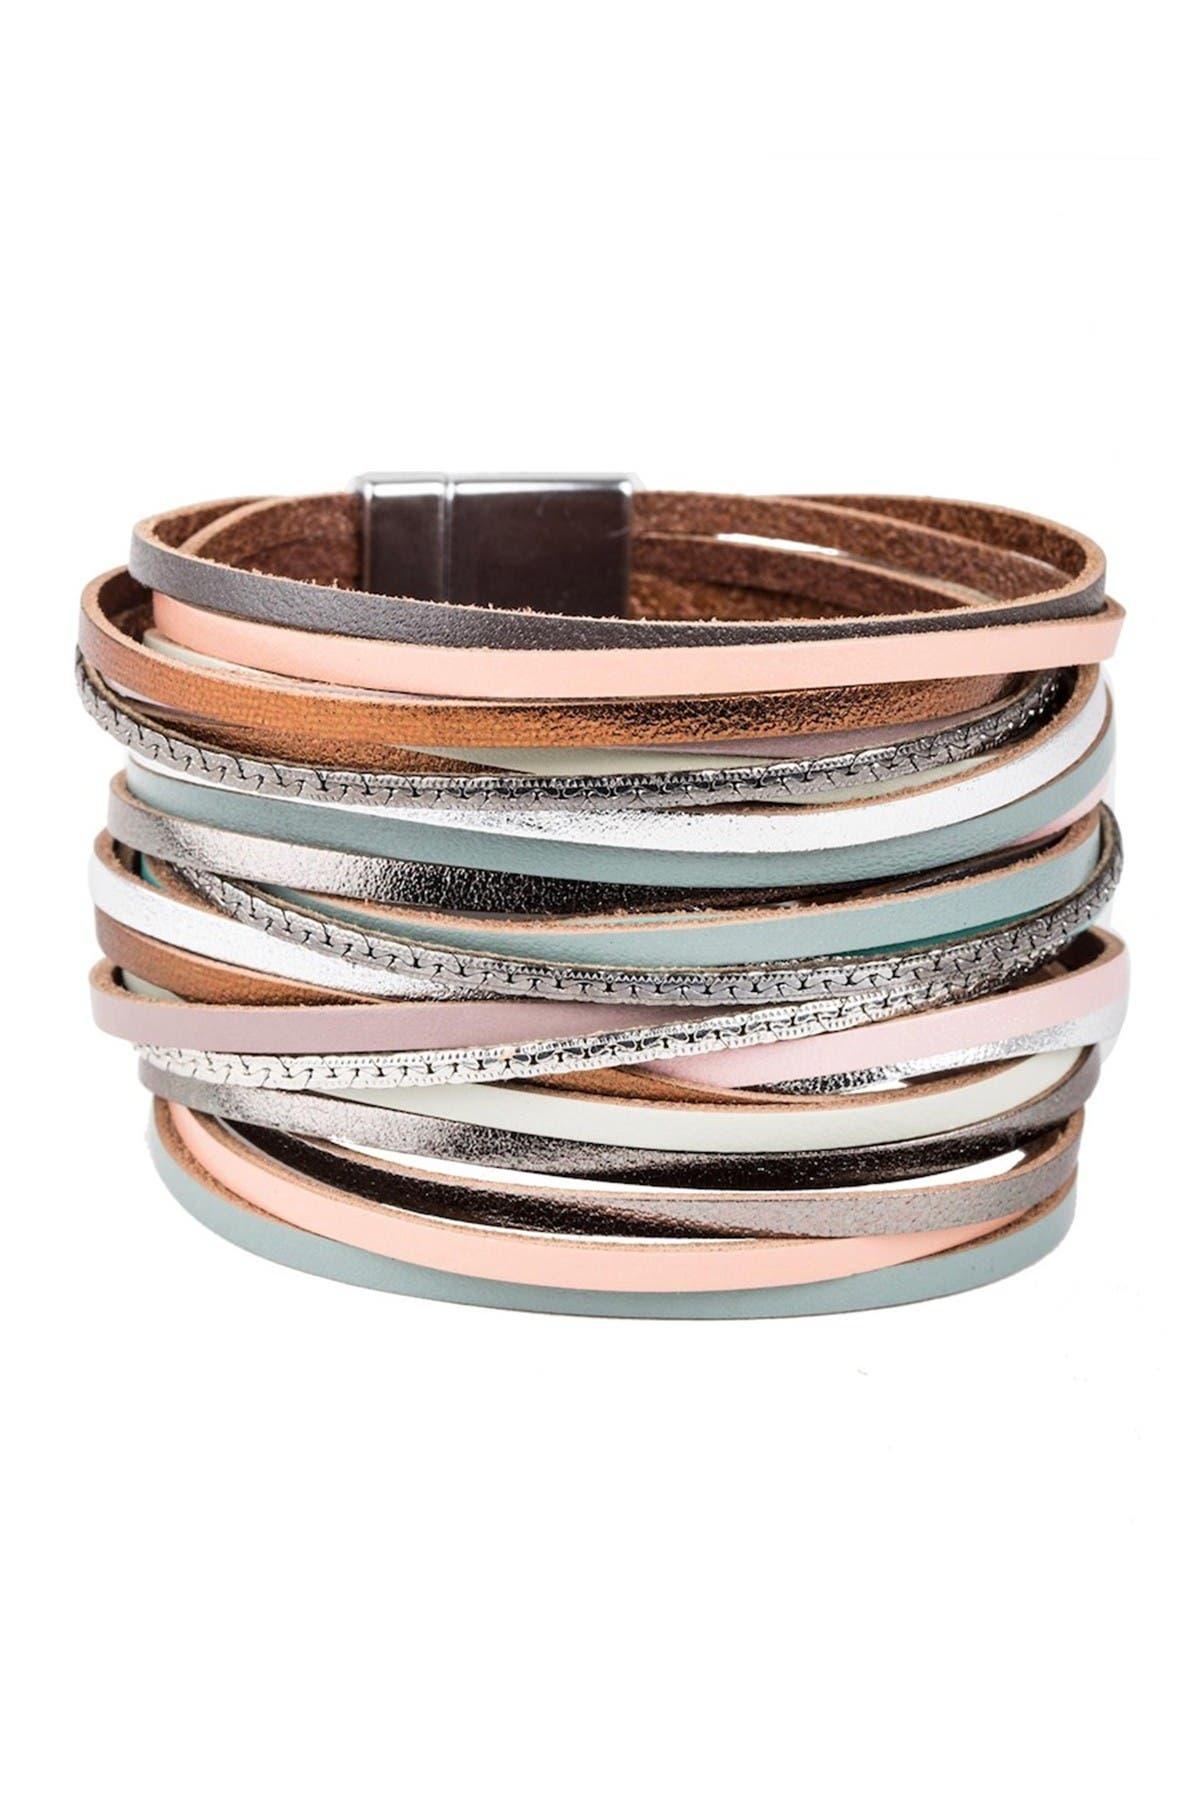 Image of Saachi On The Line Leather Bracelet